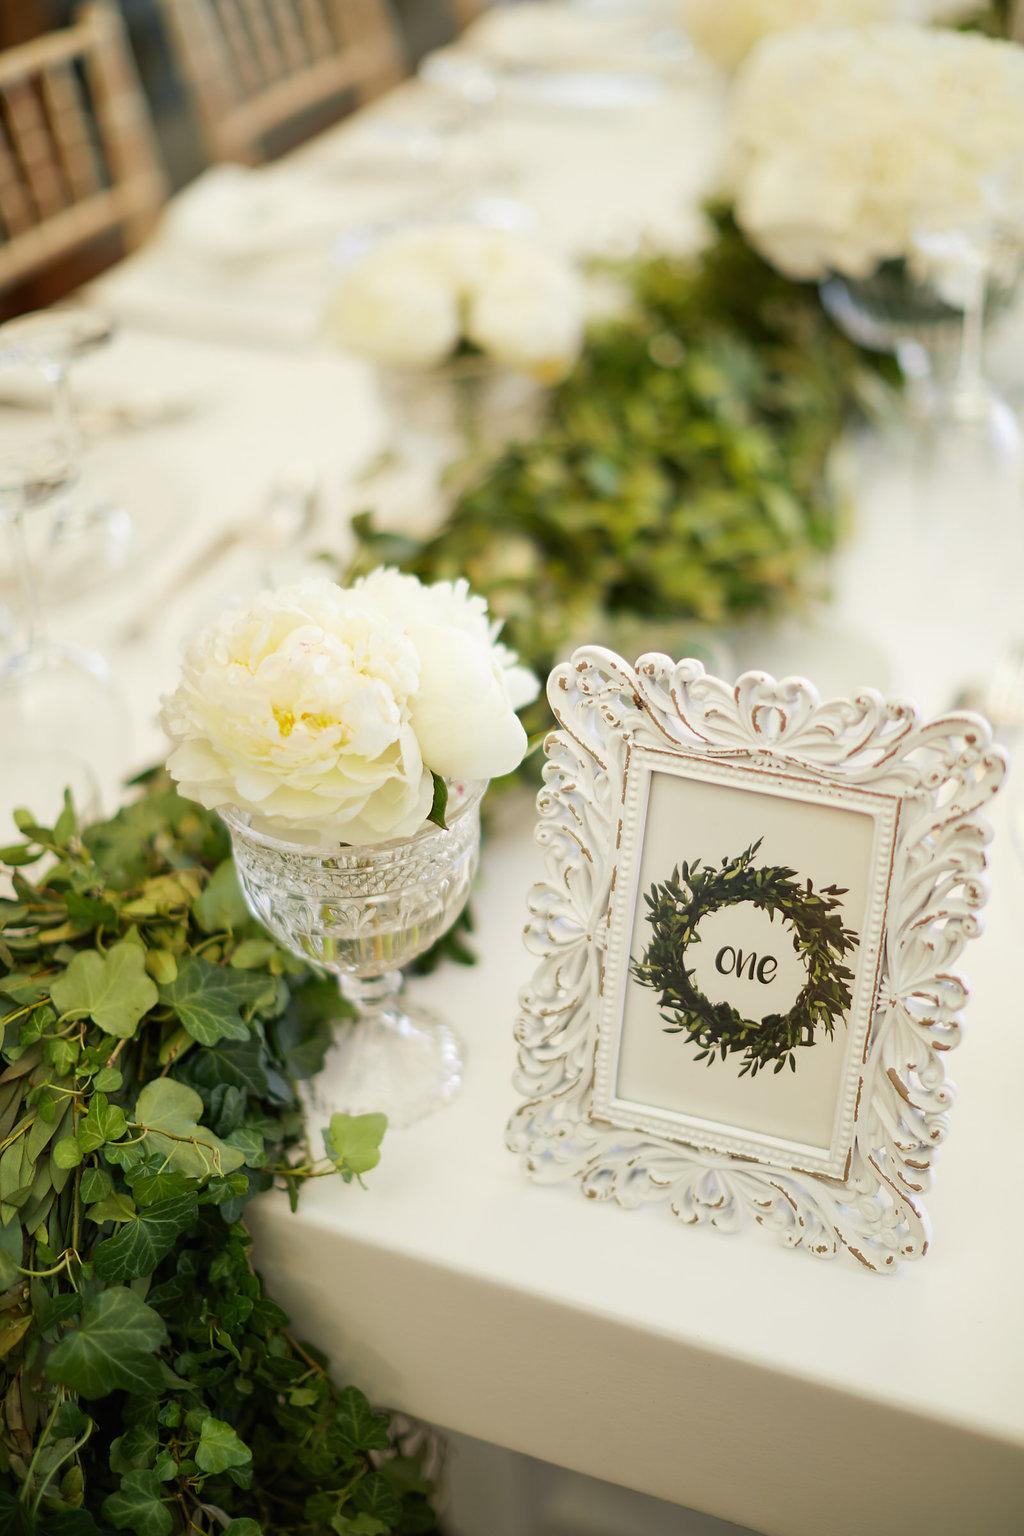 romantic vintage inspired weddings - photo by Sotiris Tsakanikas http://ruffledblog.com/chic-sunset-wedding-on-the-athens-riviera